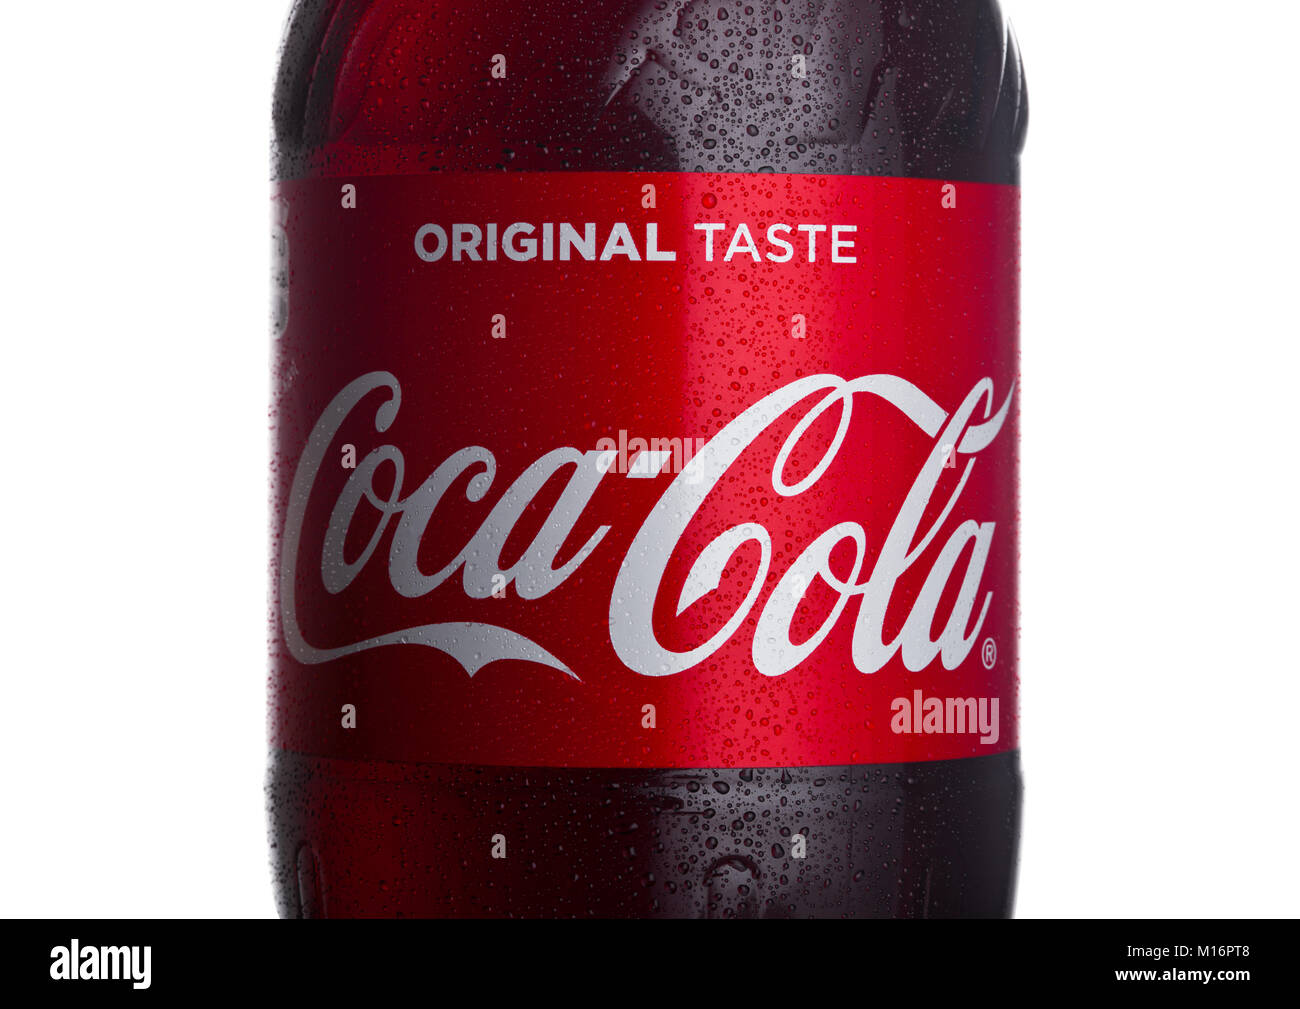 Fantastic Coca Cola World Cup 2018 - london-uk-january-24-2018-bottle-label-of-classic-coca-cola-on-white-M16PT8  Image_678145 .jpg